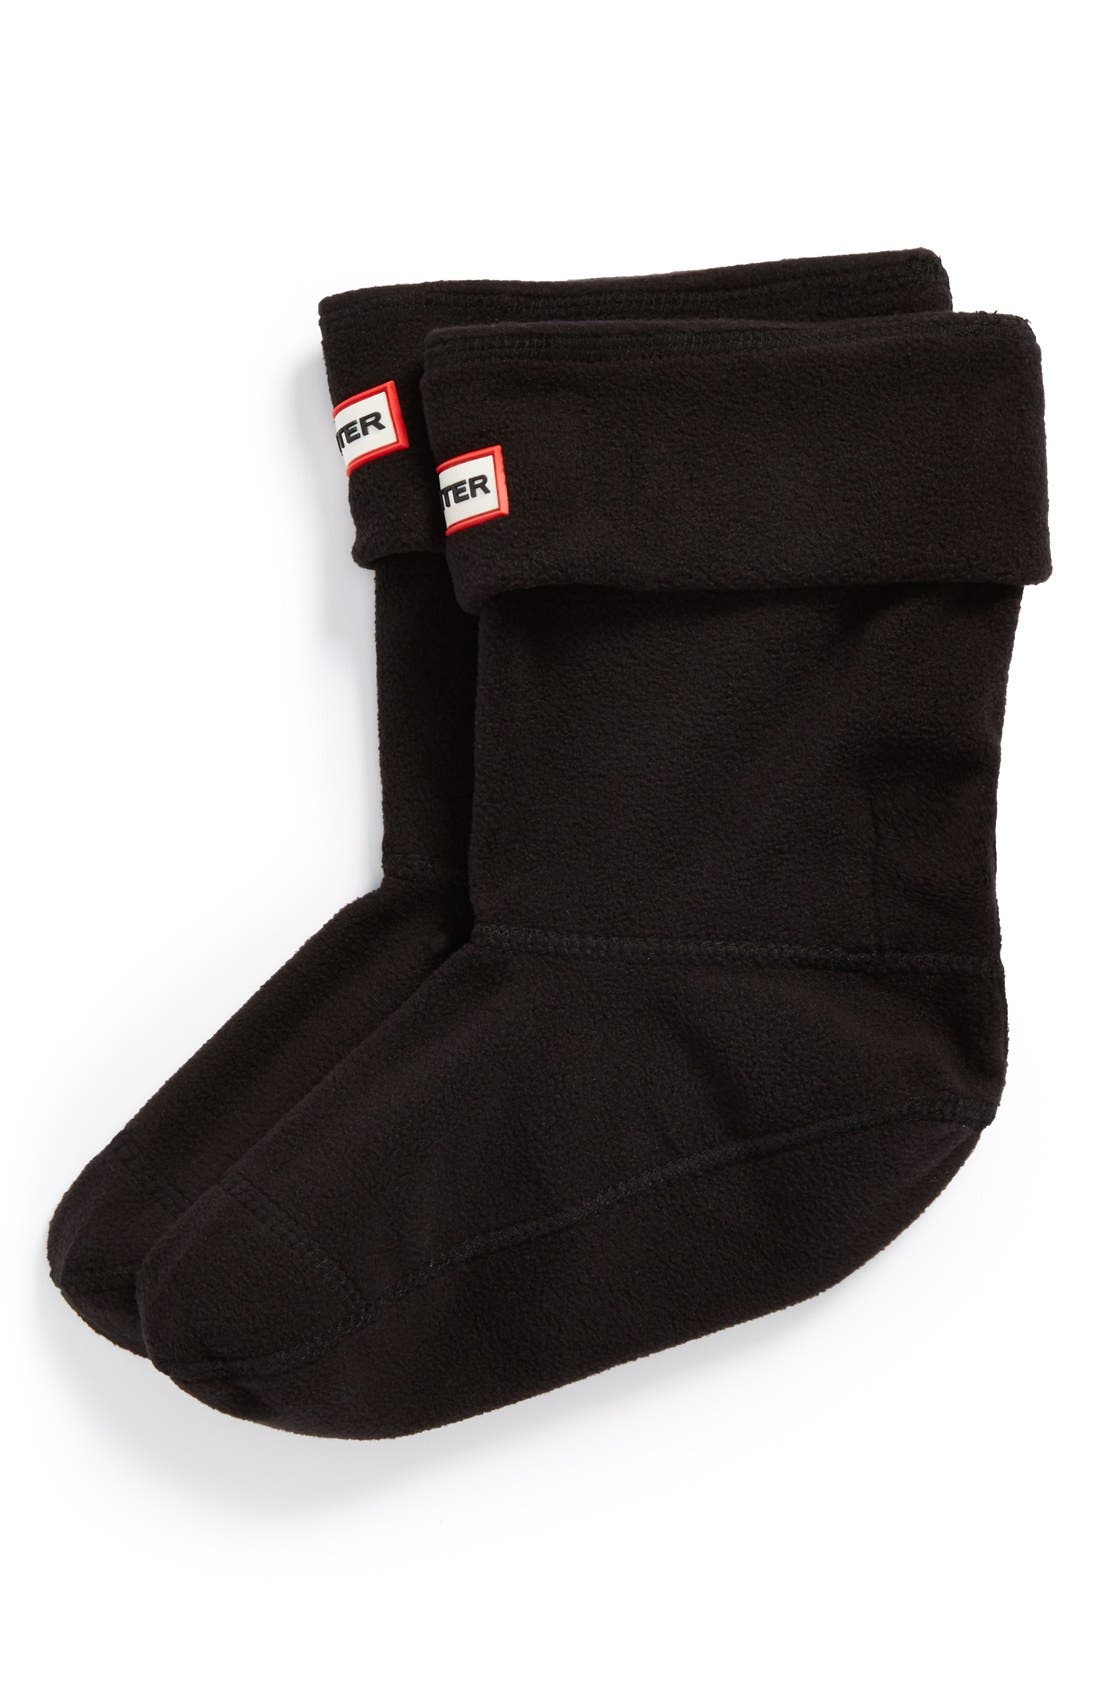 Short Fleece Welly Boot Socks,                             Main thumbnail 1, color,                             Black Fleece